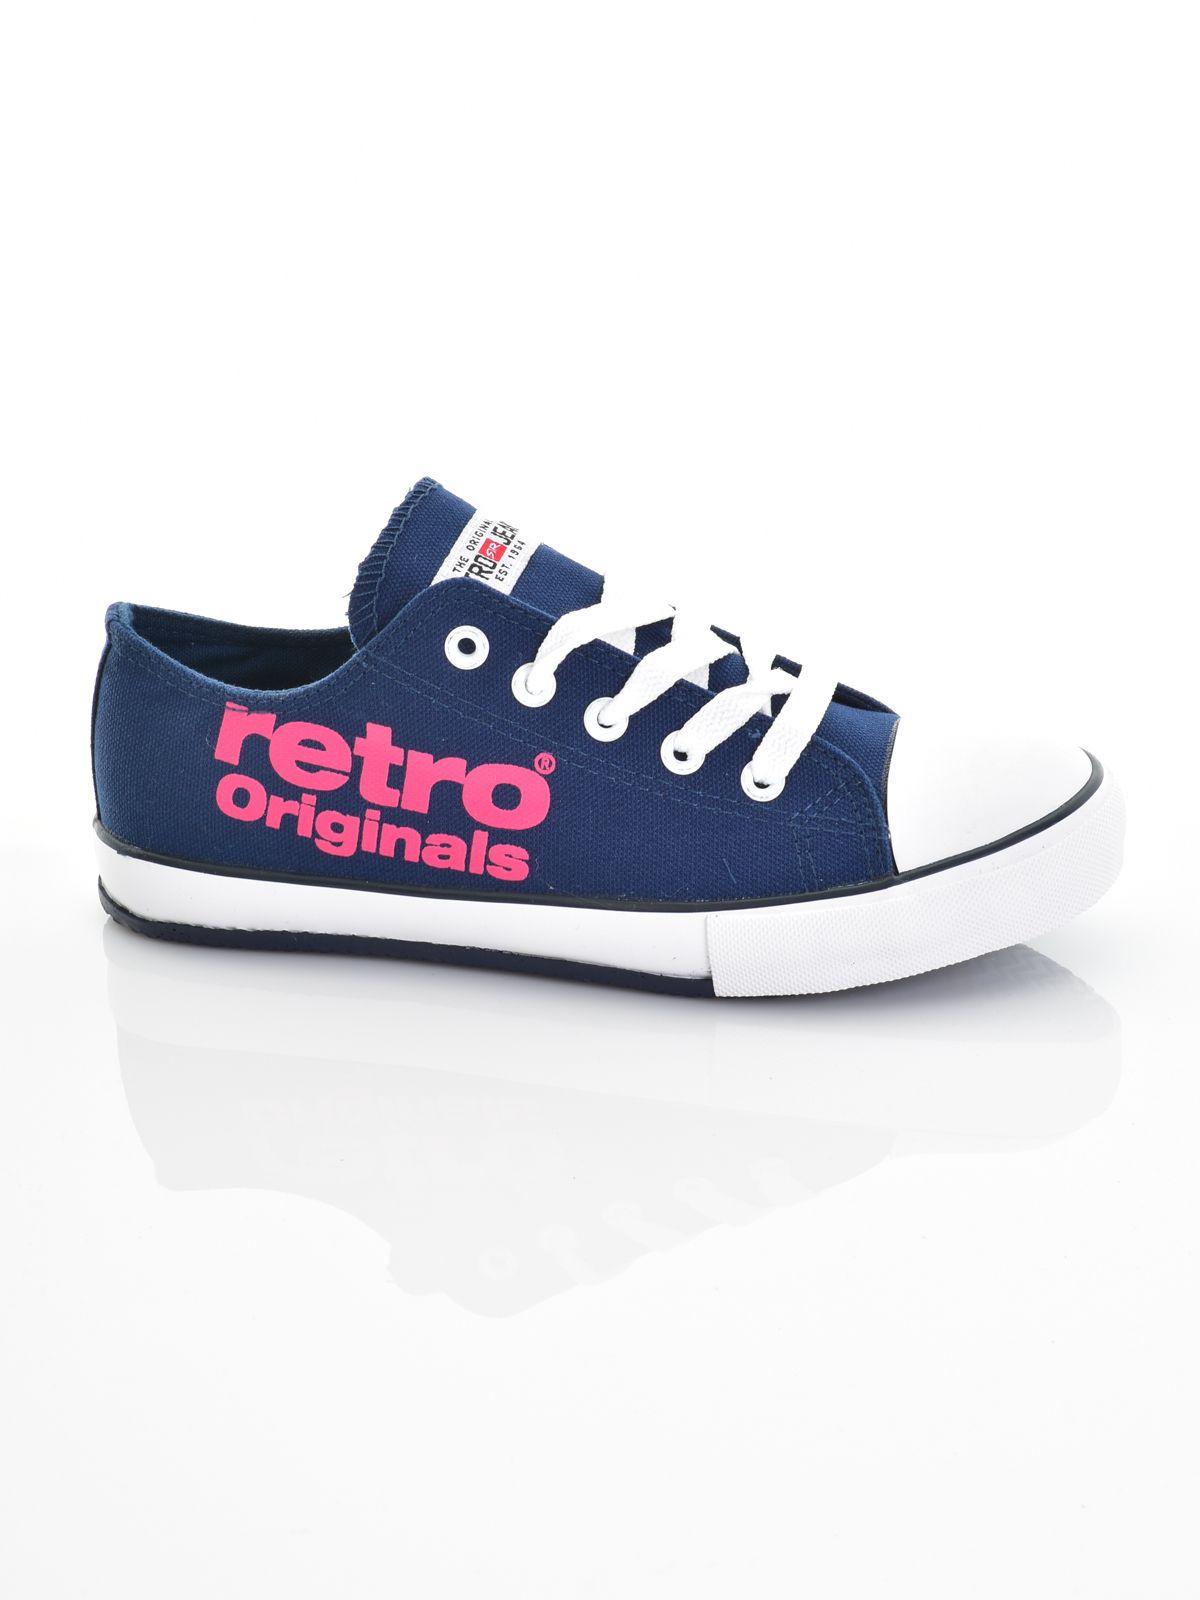 Retro Jeans női cipő GEORGIA 18 SNEAKERS   Markasbolt.hu